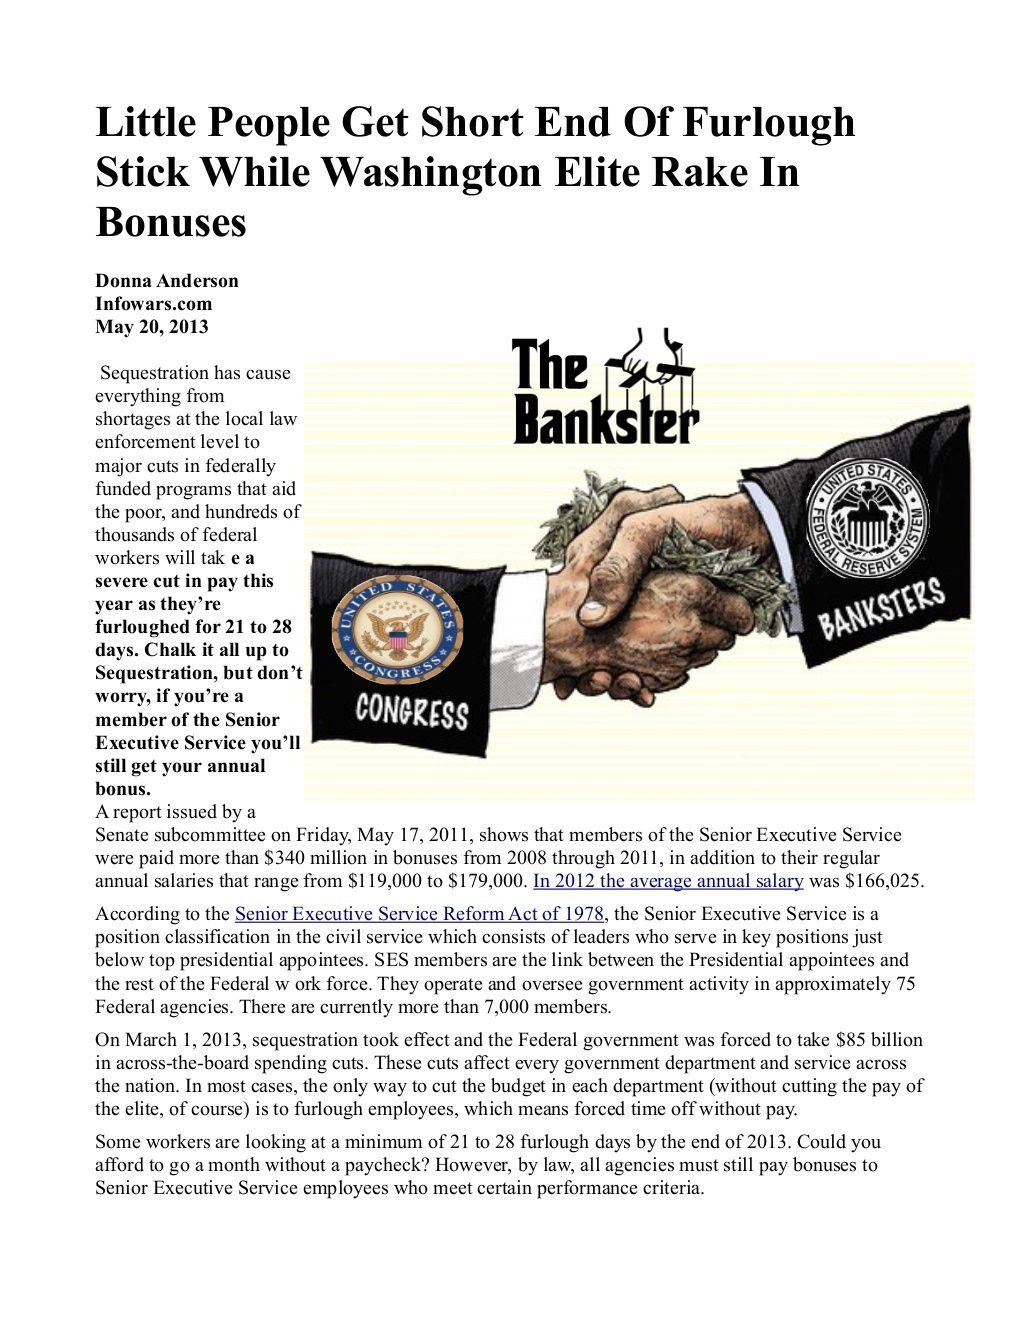 Little People Get Short End Of Furlough Stick While Washington Elite Rake In Bonuses